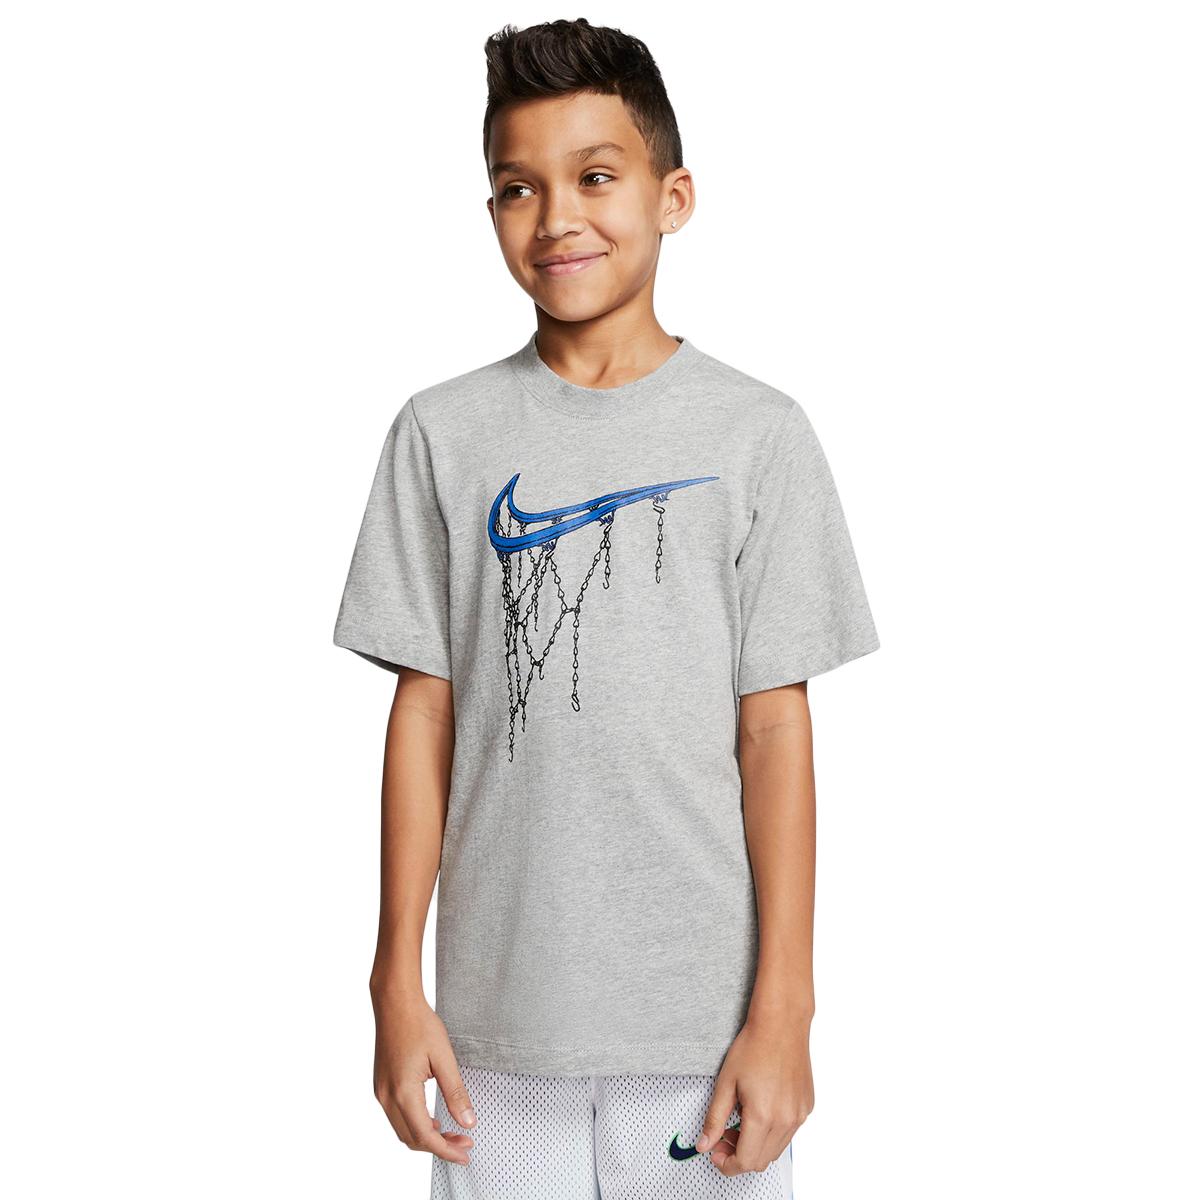 Nike Boys' 8-20 Nsw Swoosh Rim Tee - Black, XL